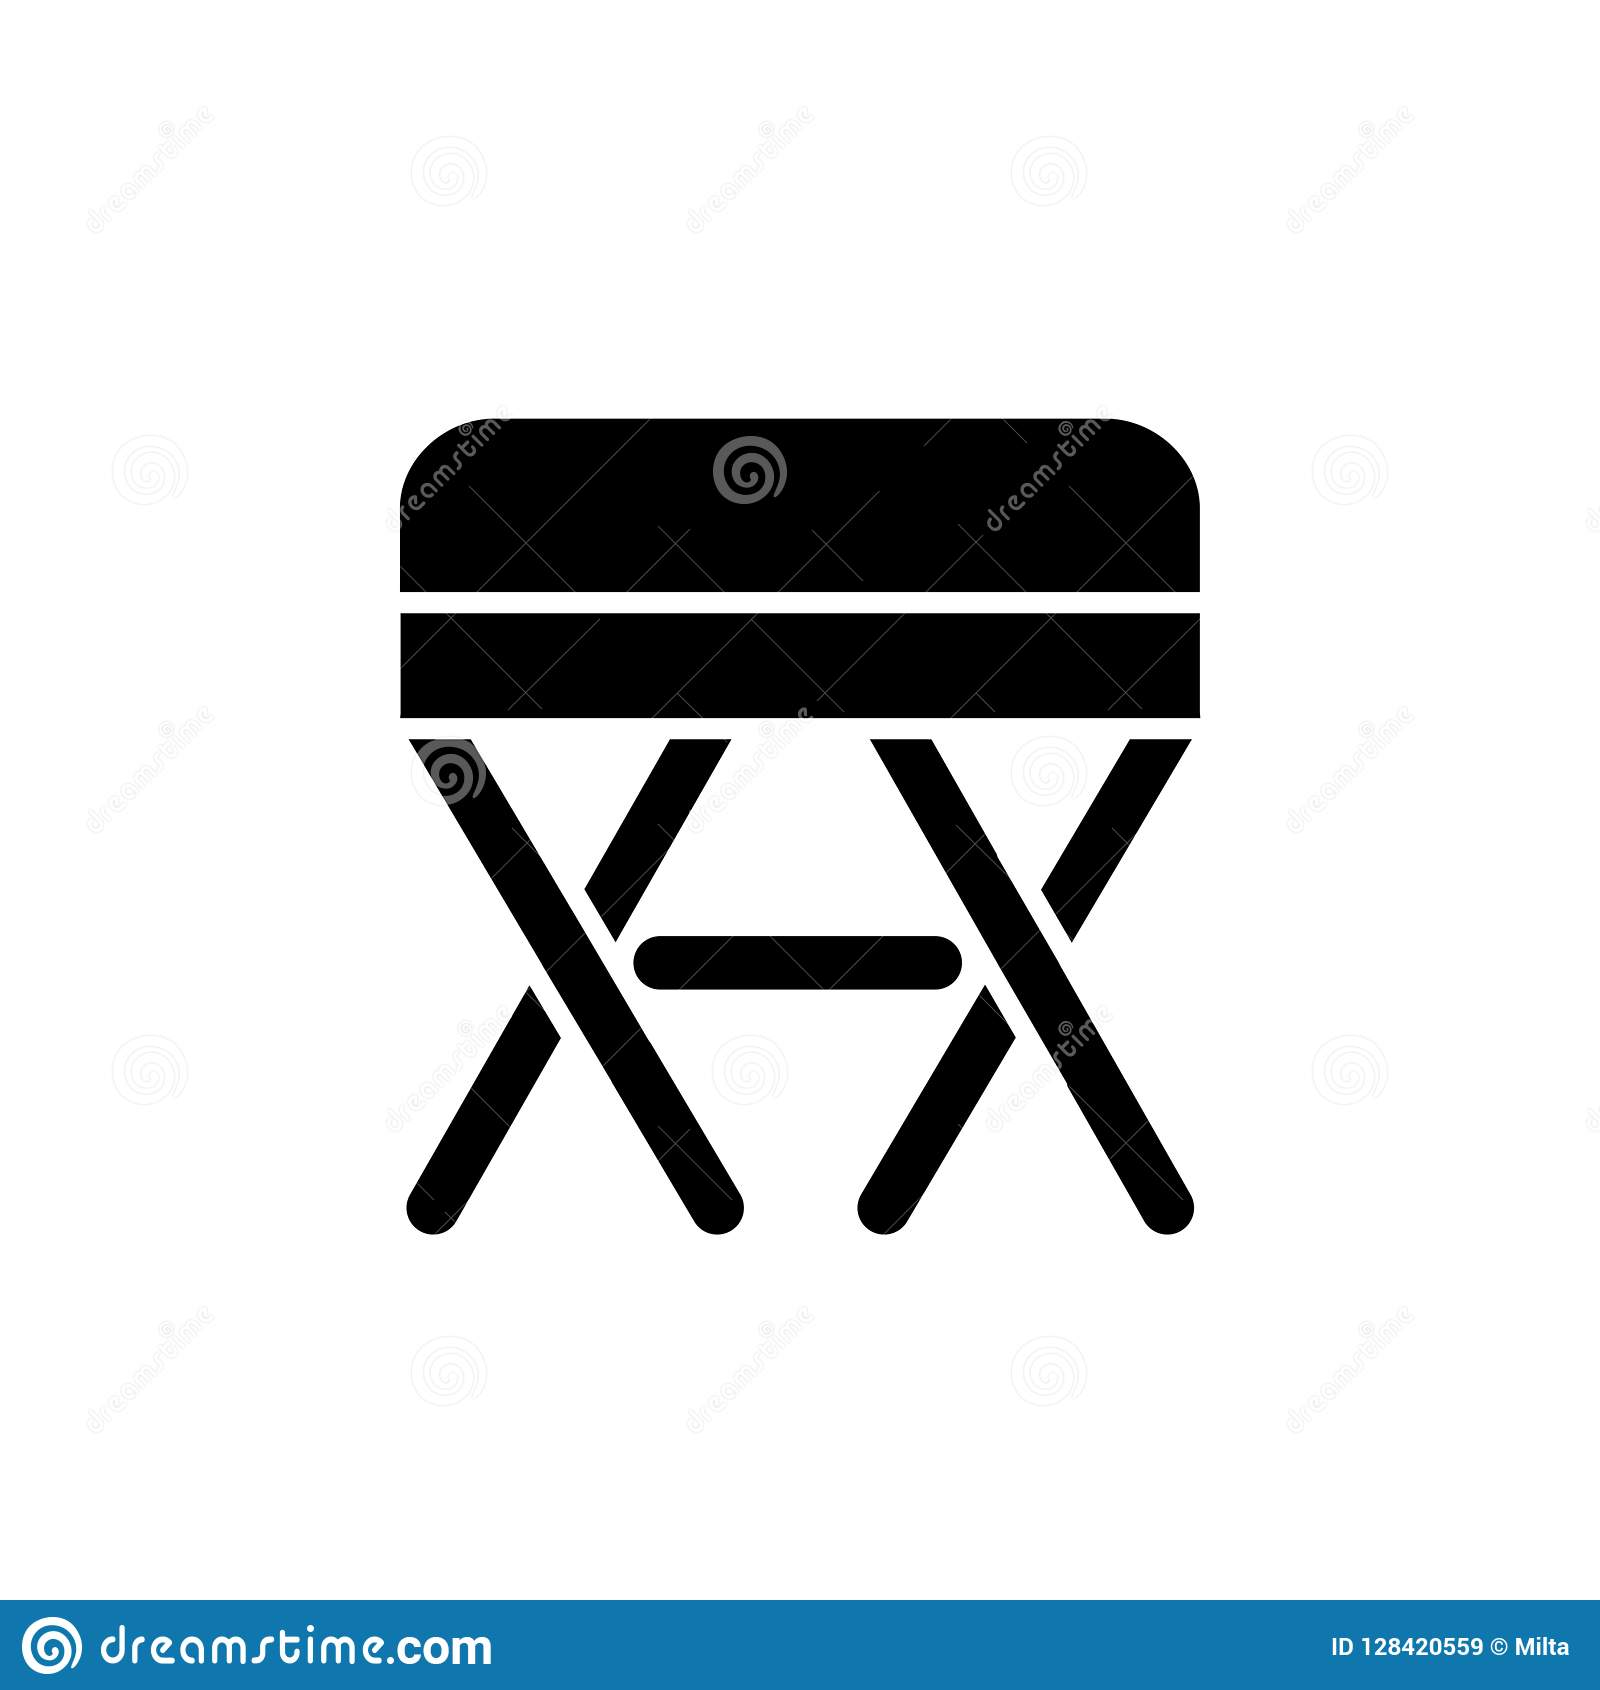 Astounding Black White Vector Illustration Of Square Ottoman Pouf Evergreenethics Interior Chair Design Evergreenethicsorg